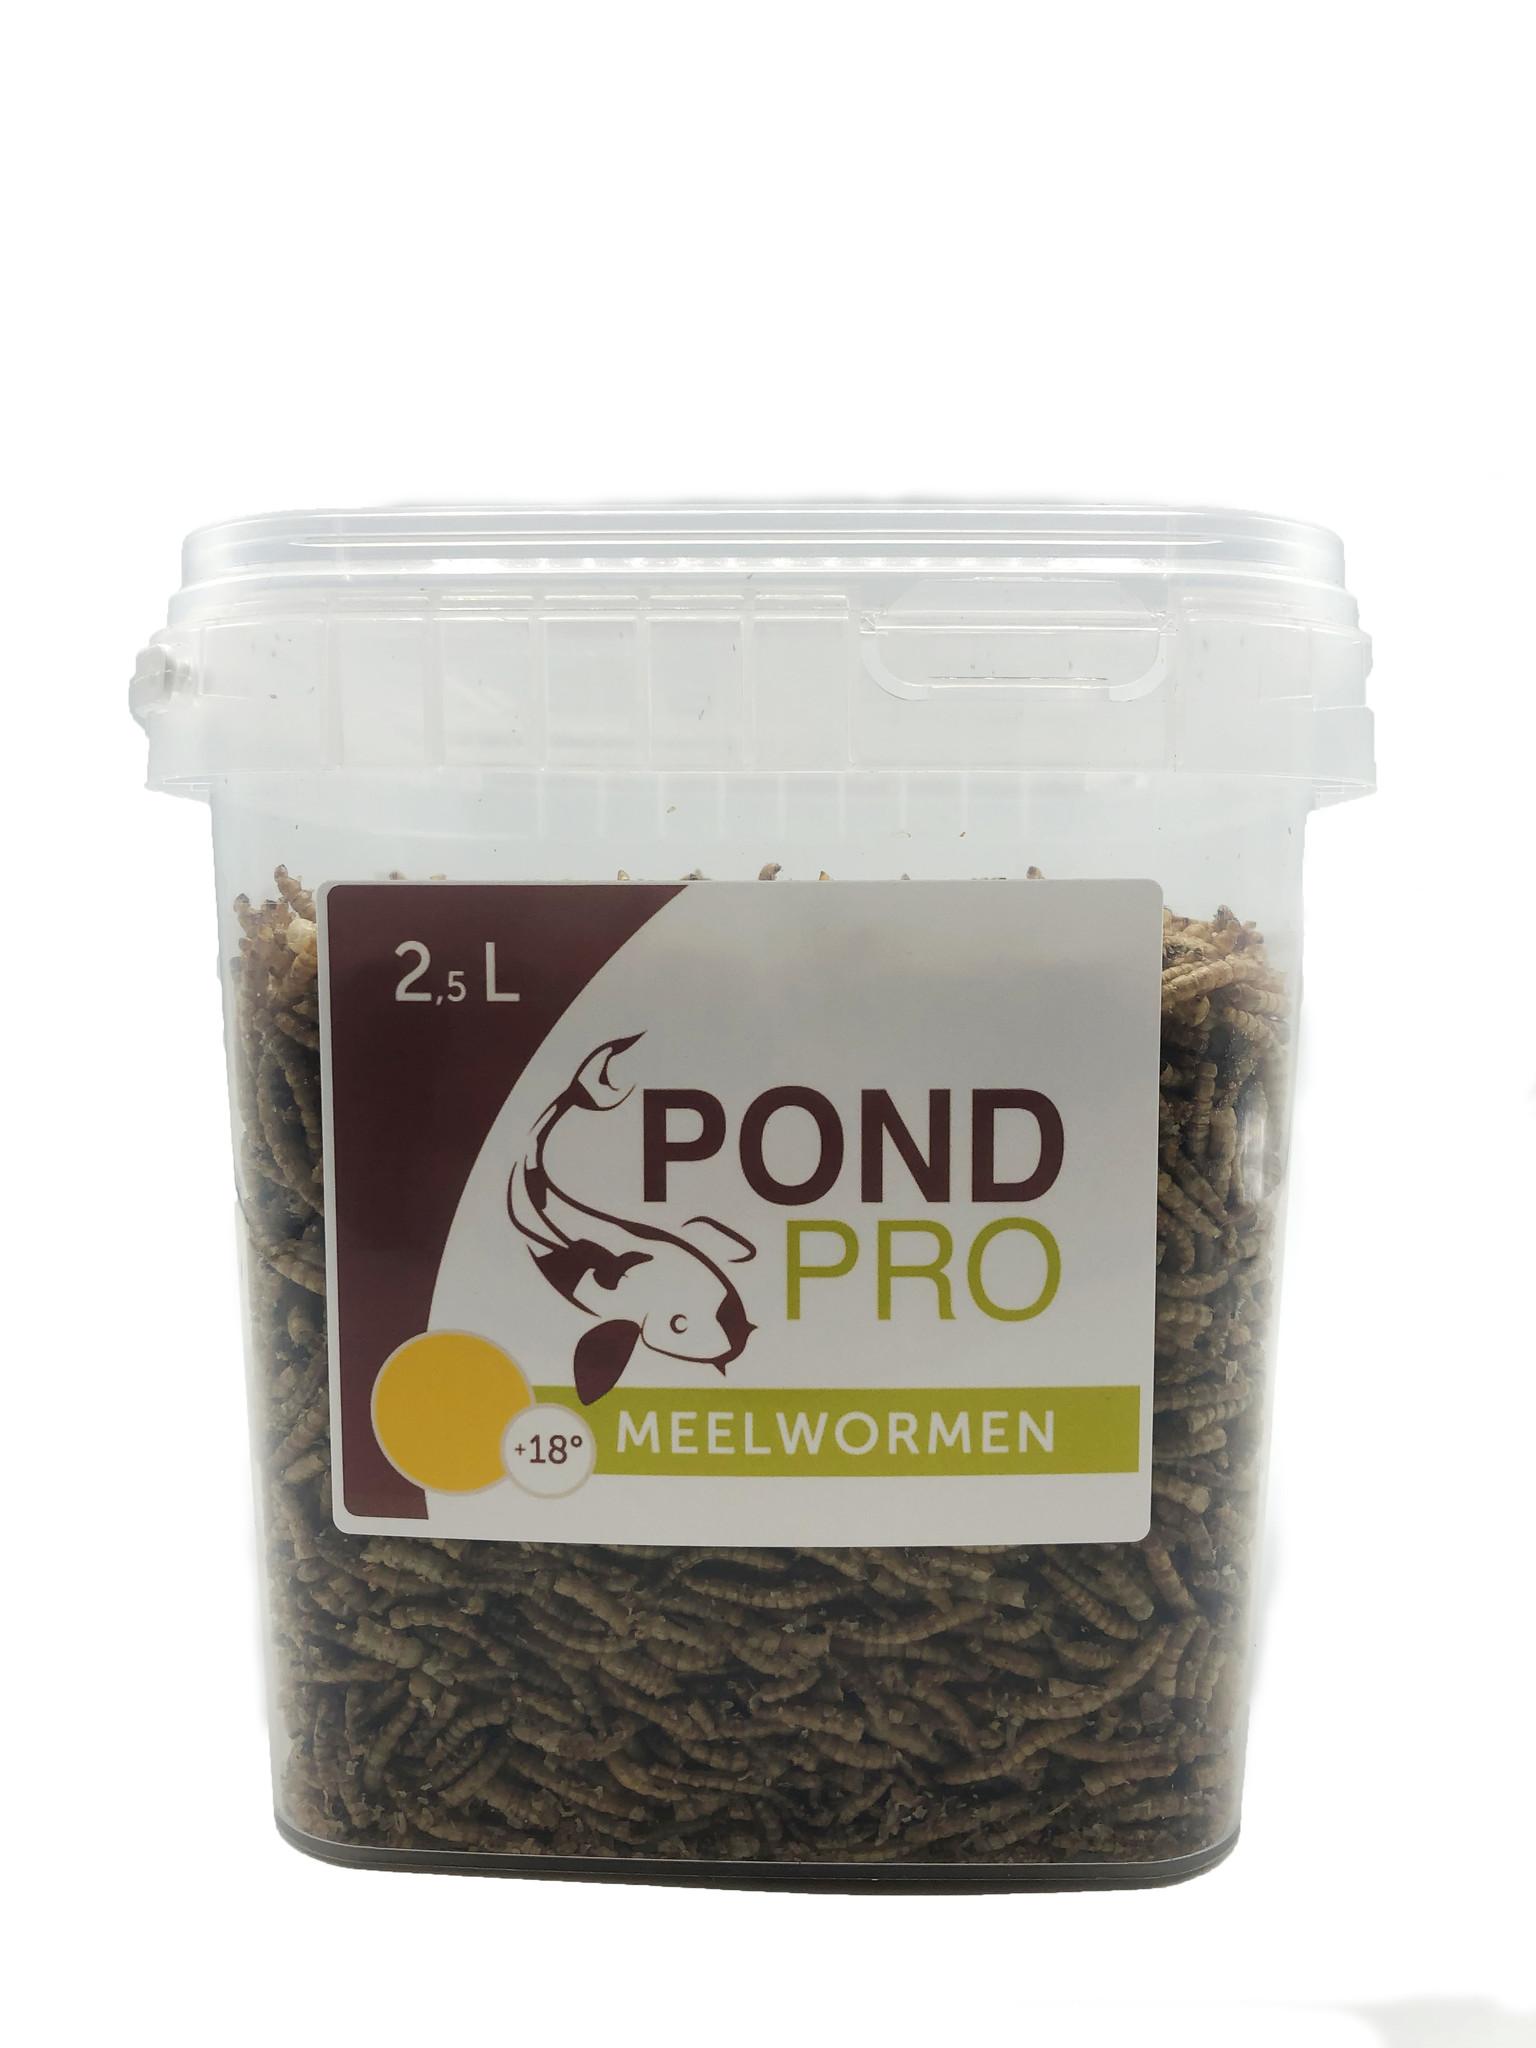 Pond Pro Pond Pro Meelwormen - 2,5 Liter Emmer kopen